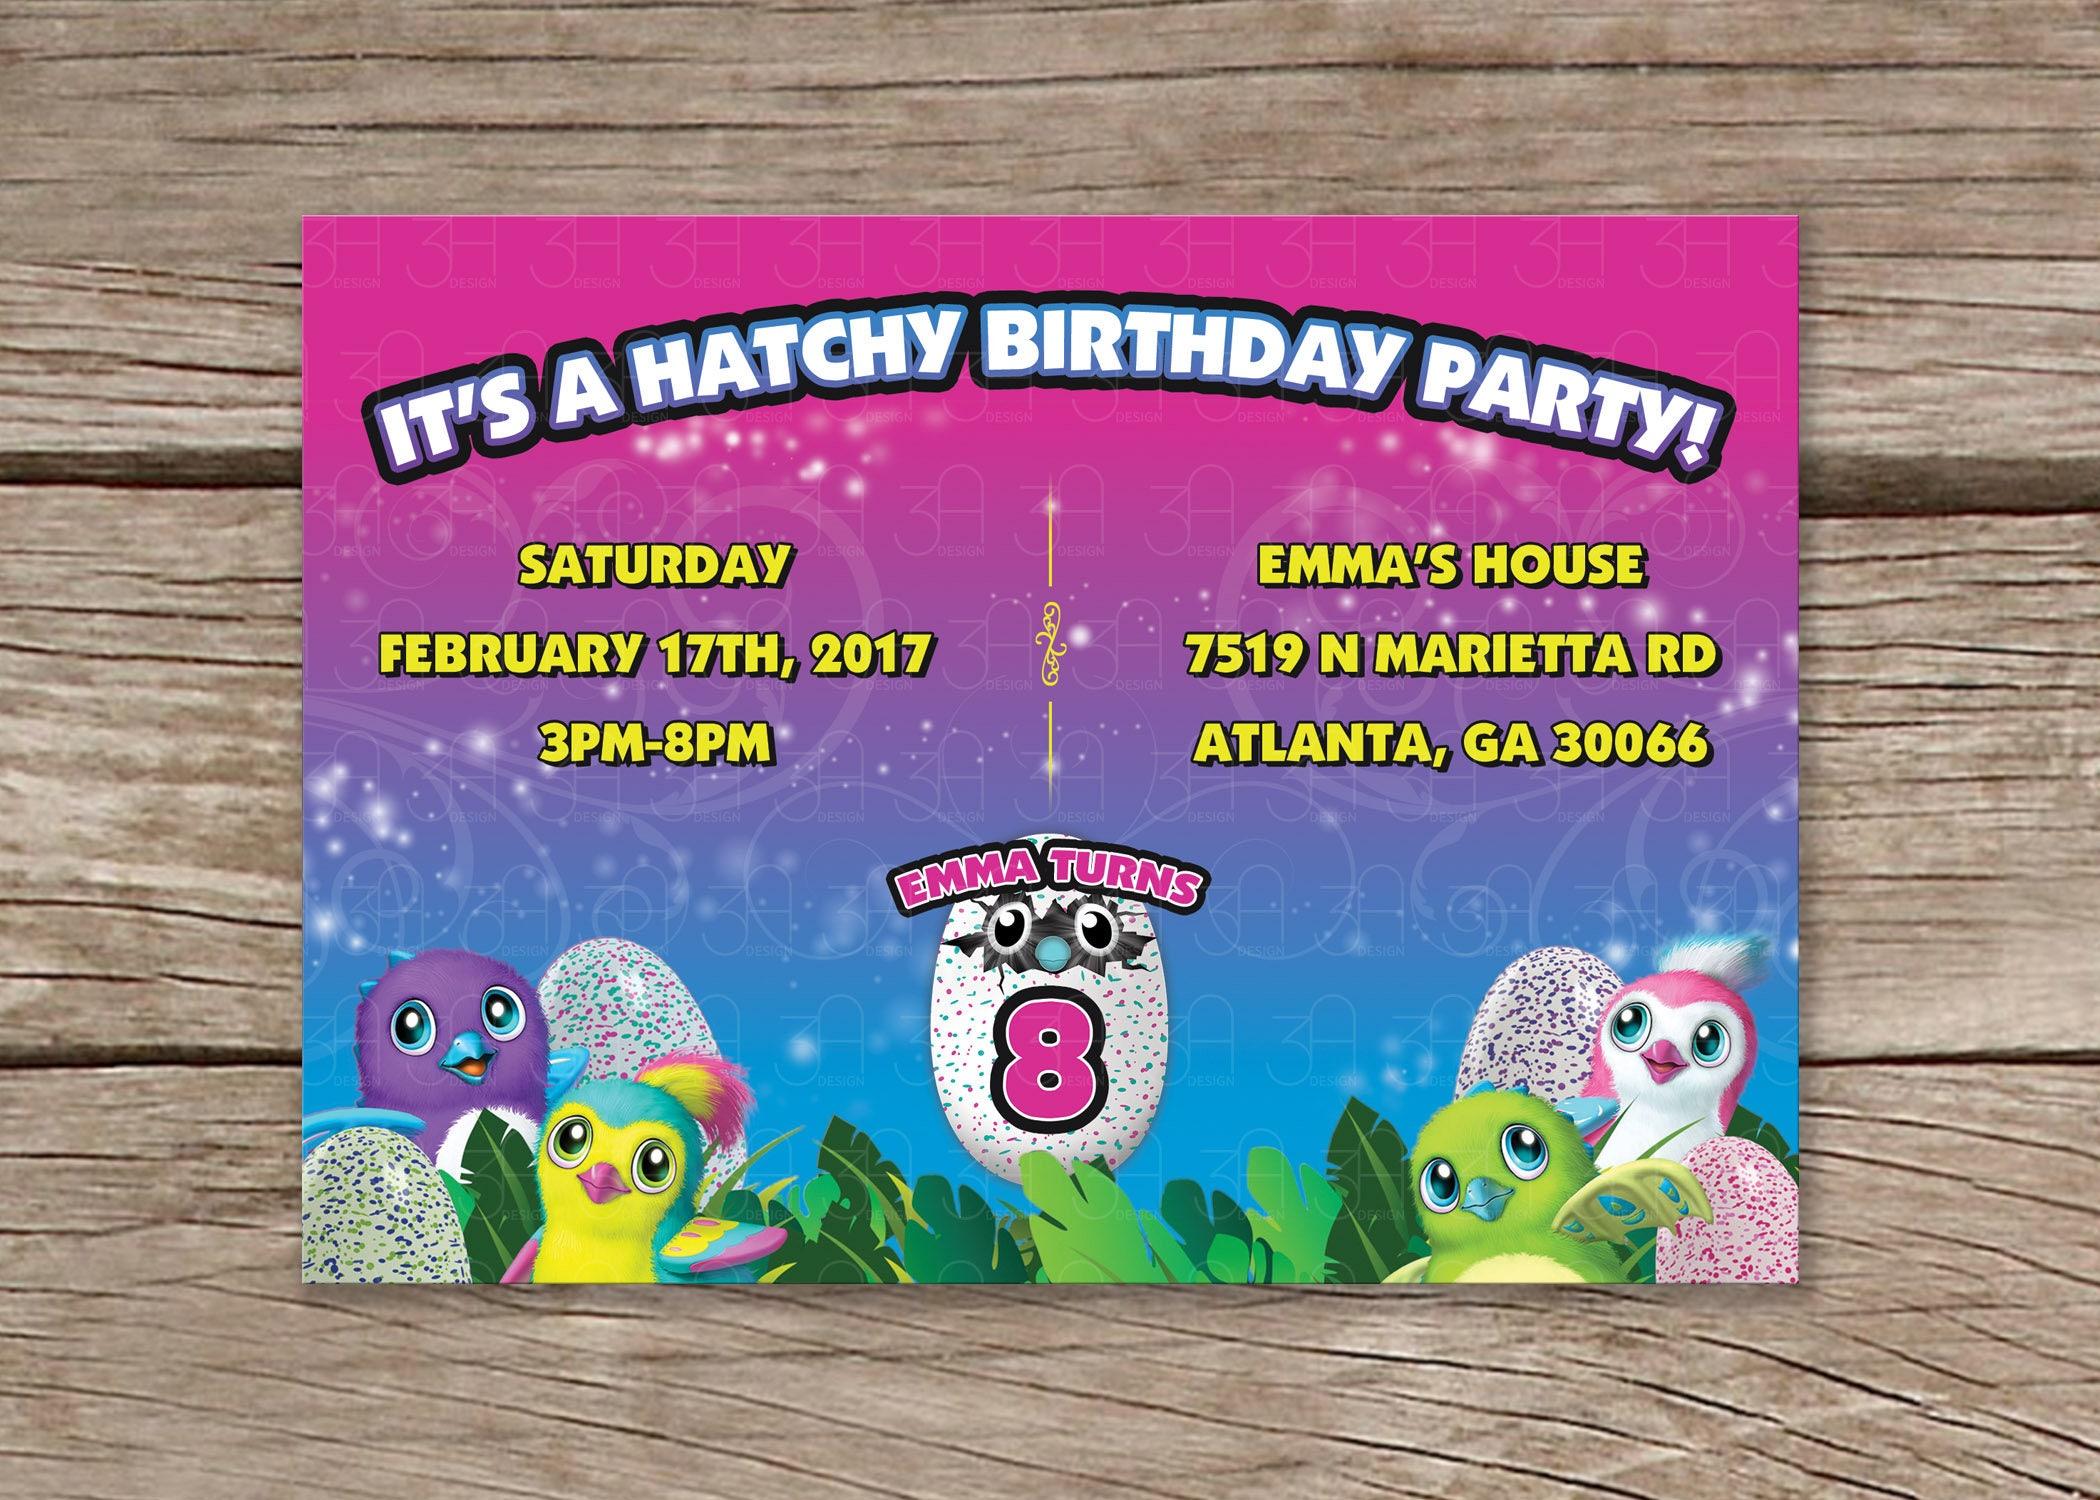 Printable birthday invitation evite digital file zoom kristyandbryce Images